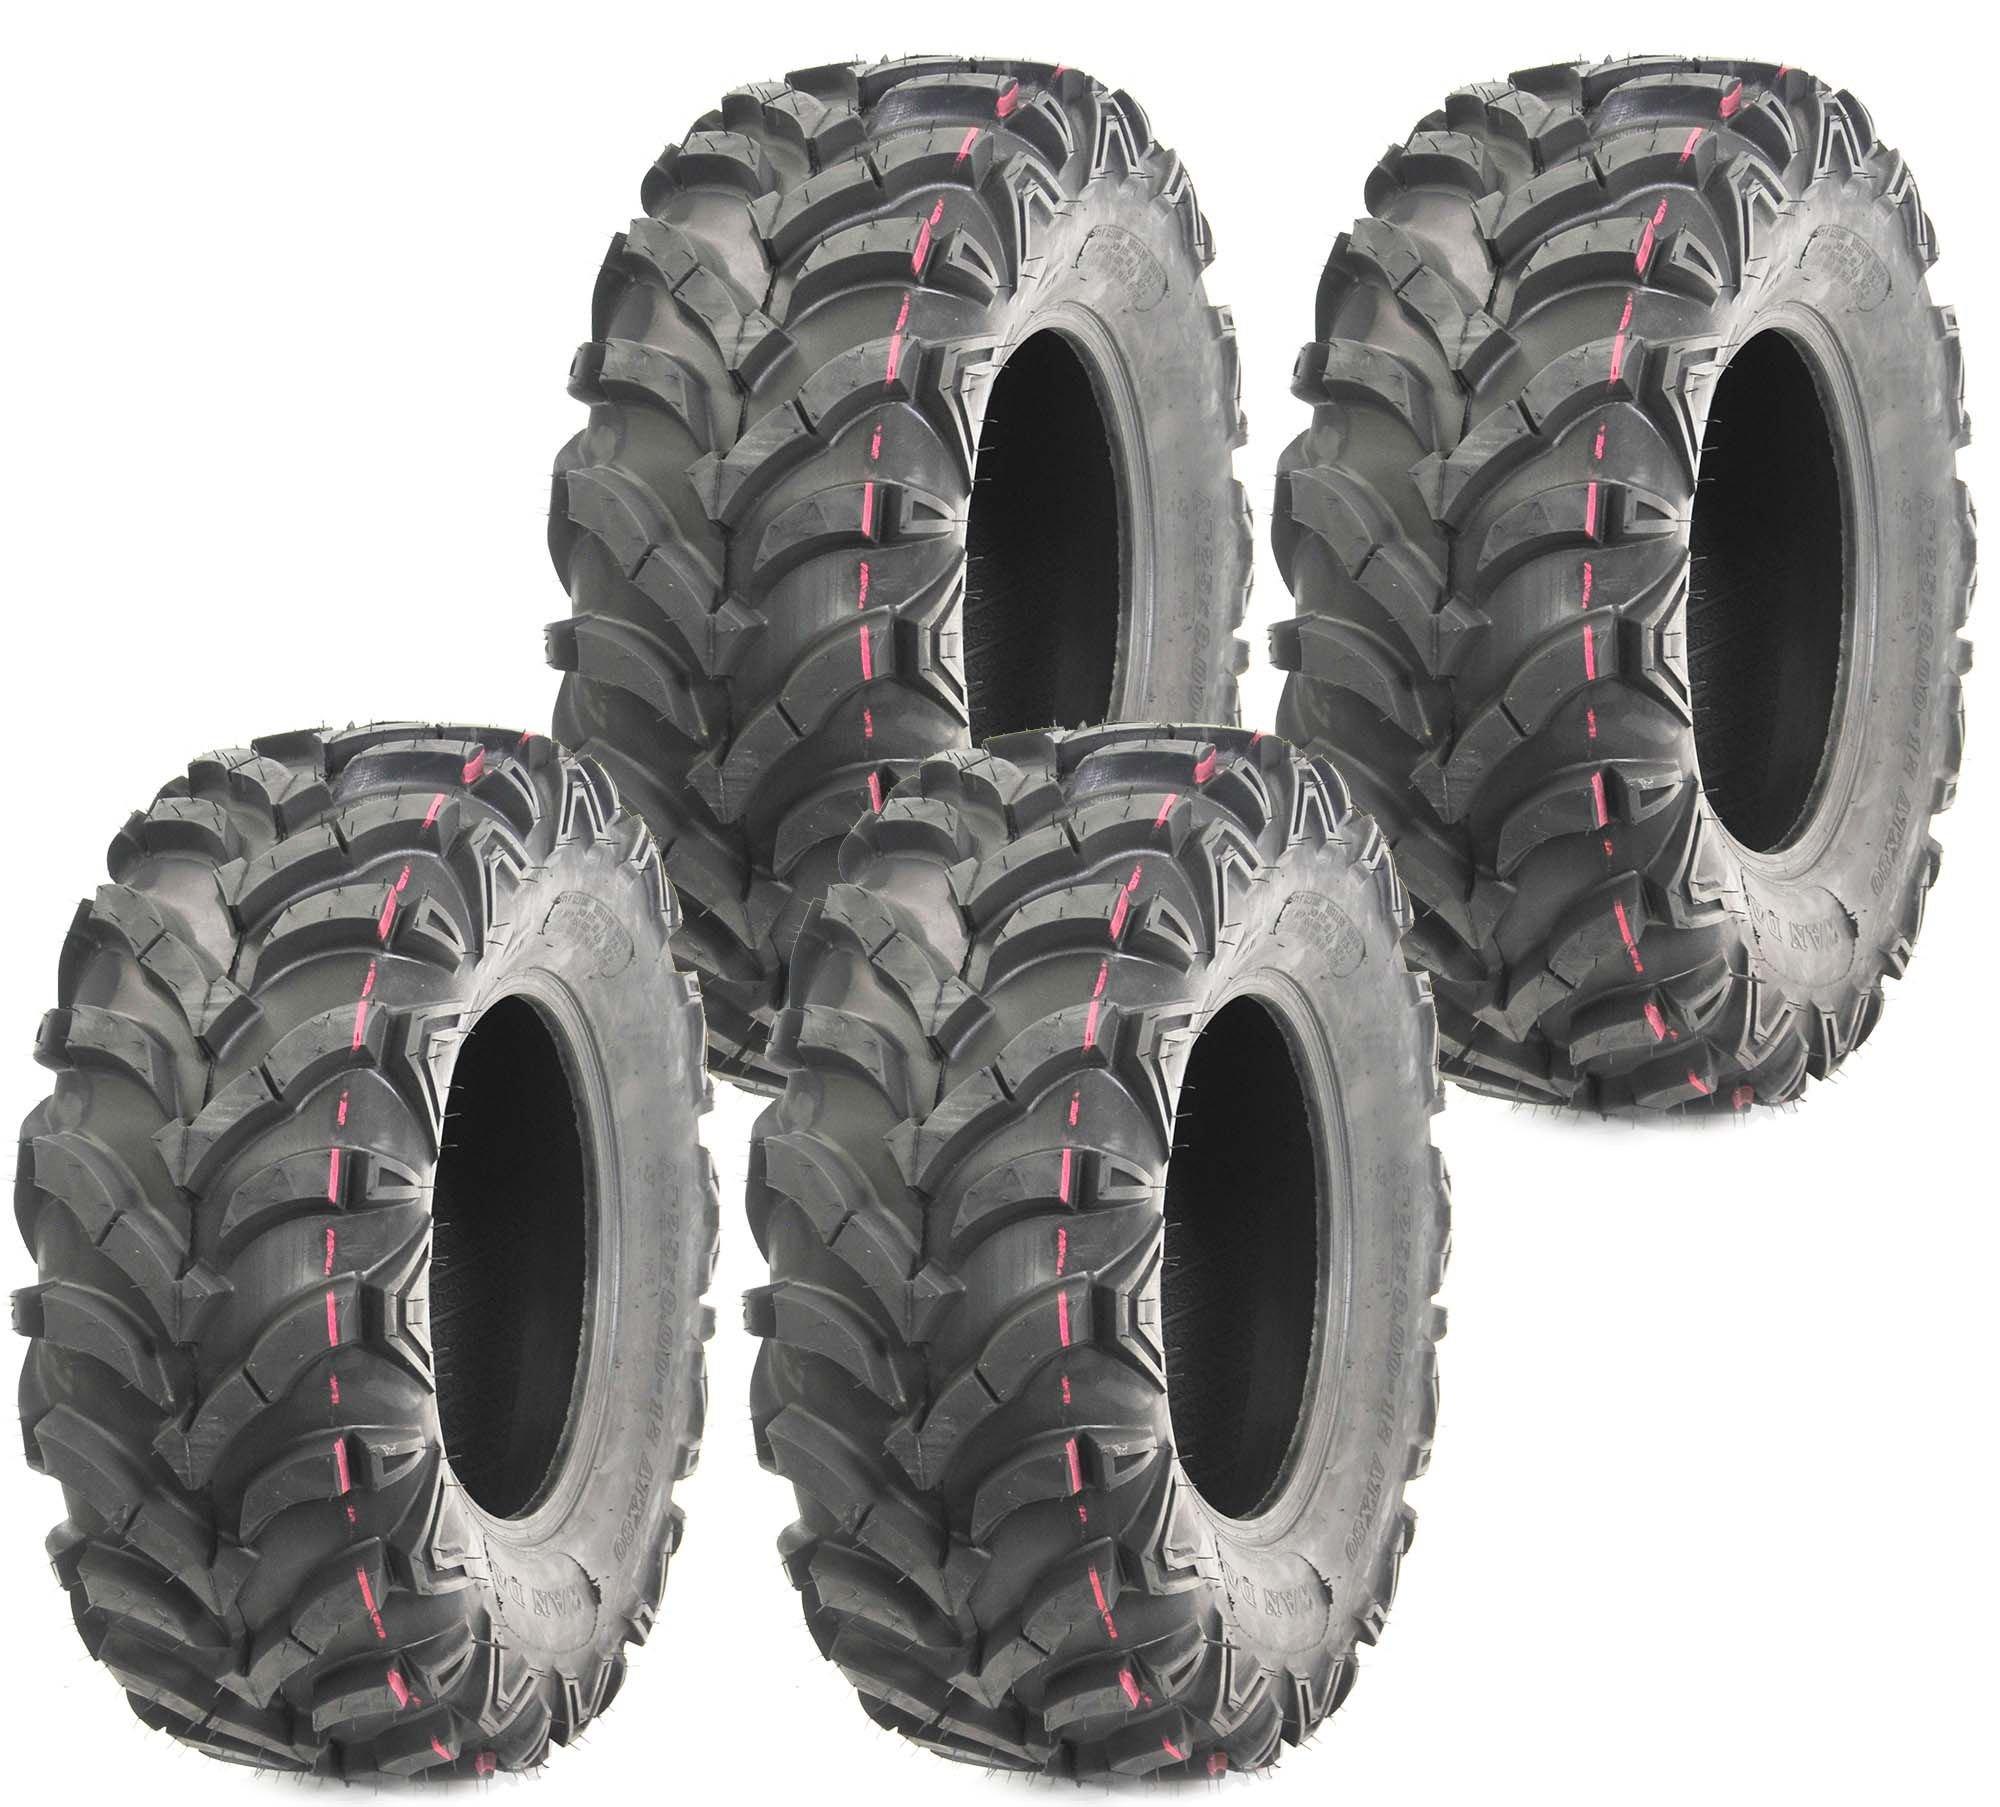 Set of 4 WANDA ATV UTV tires 25x8-12 25X8X12 Front & Rear 6PR P341 ... by WANDA